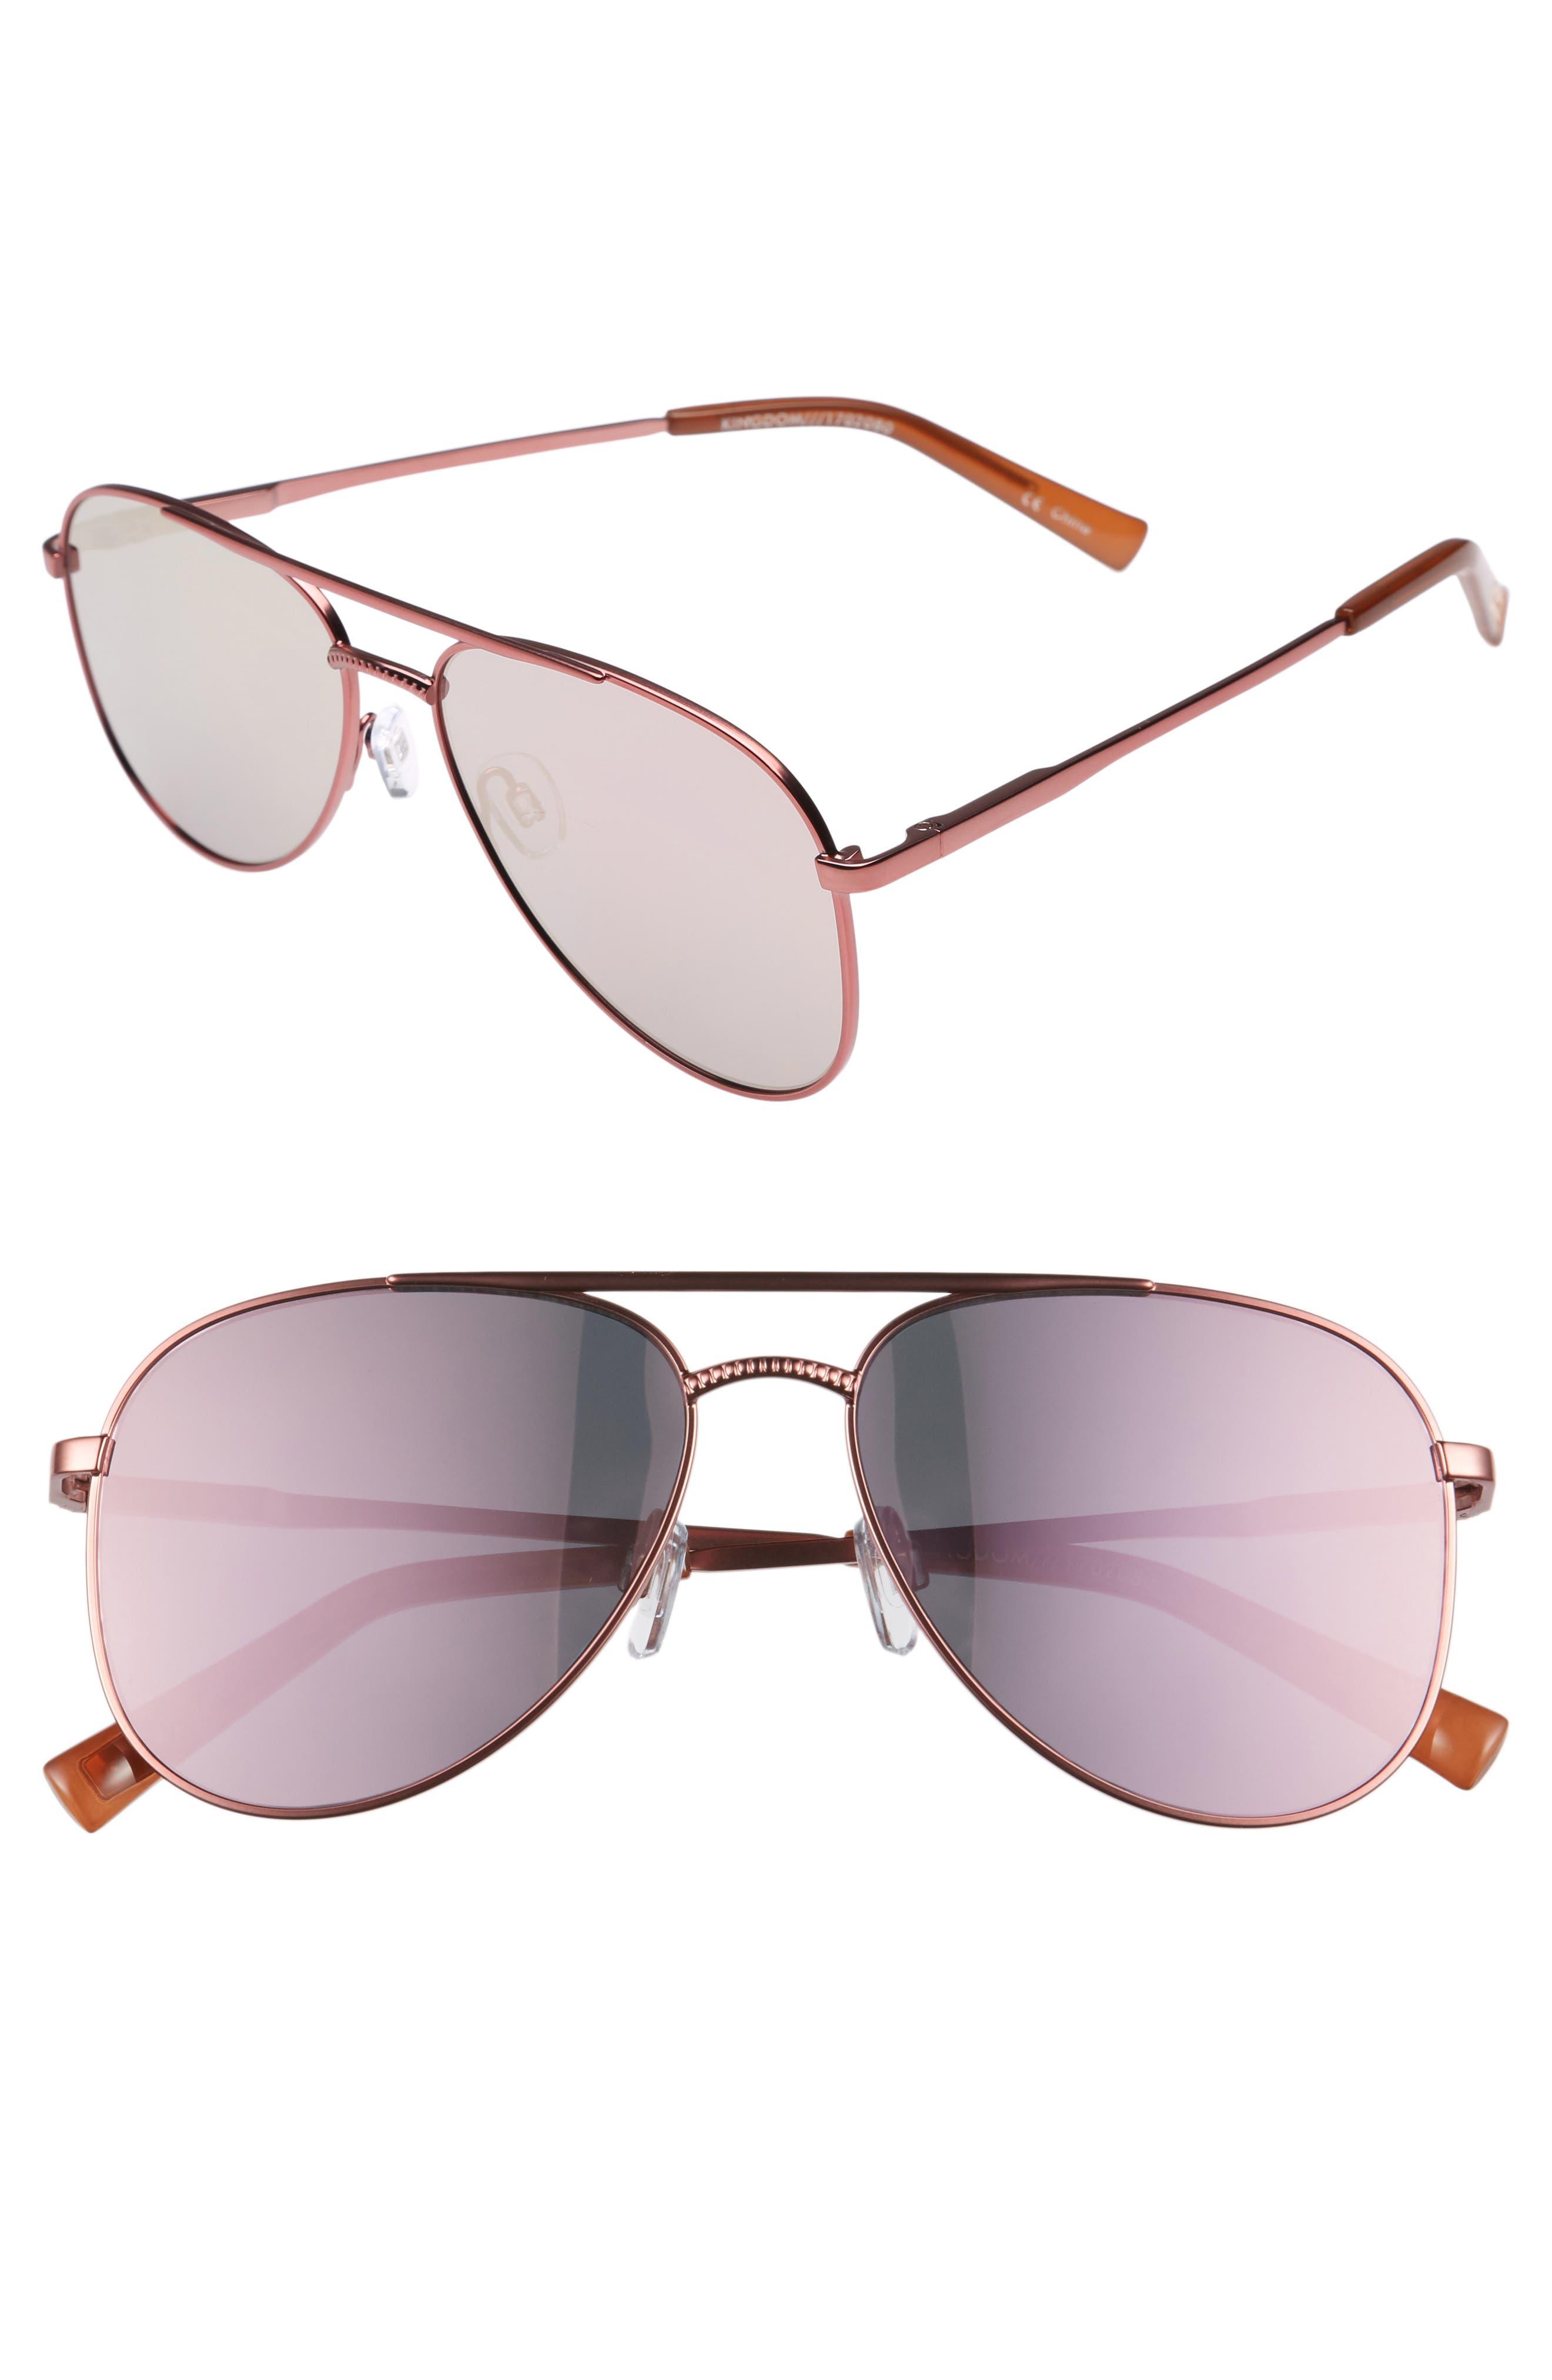 Kingdom 57mm Polarized Aviator Sunglasses,                         Main,                         color, 650